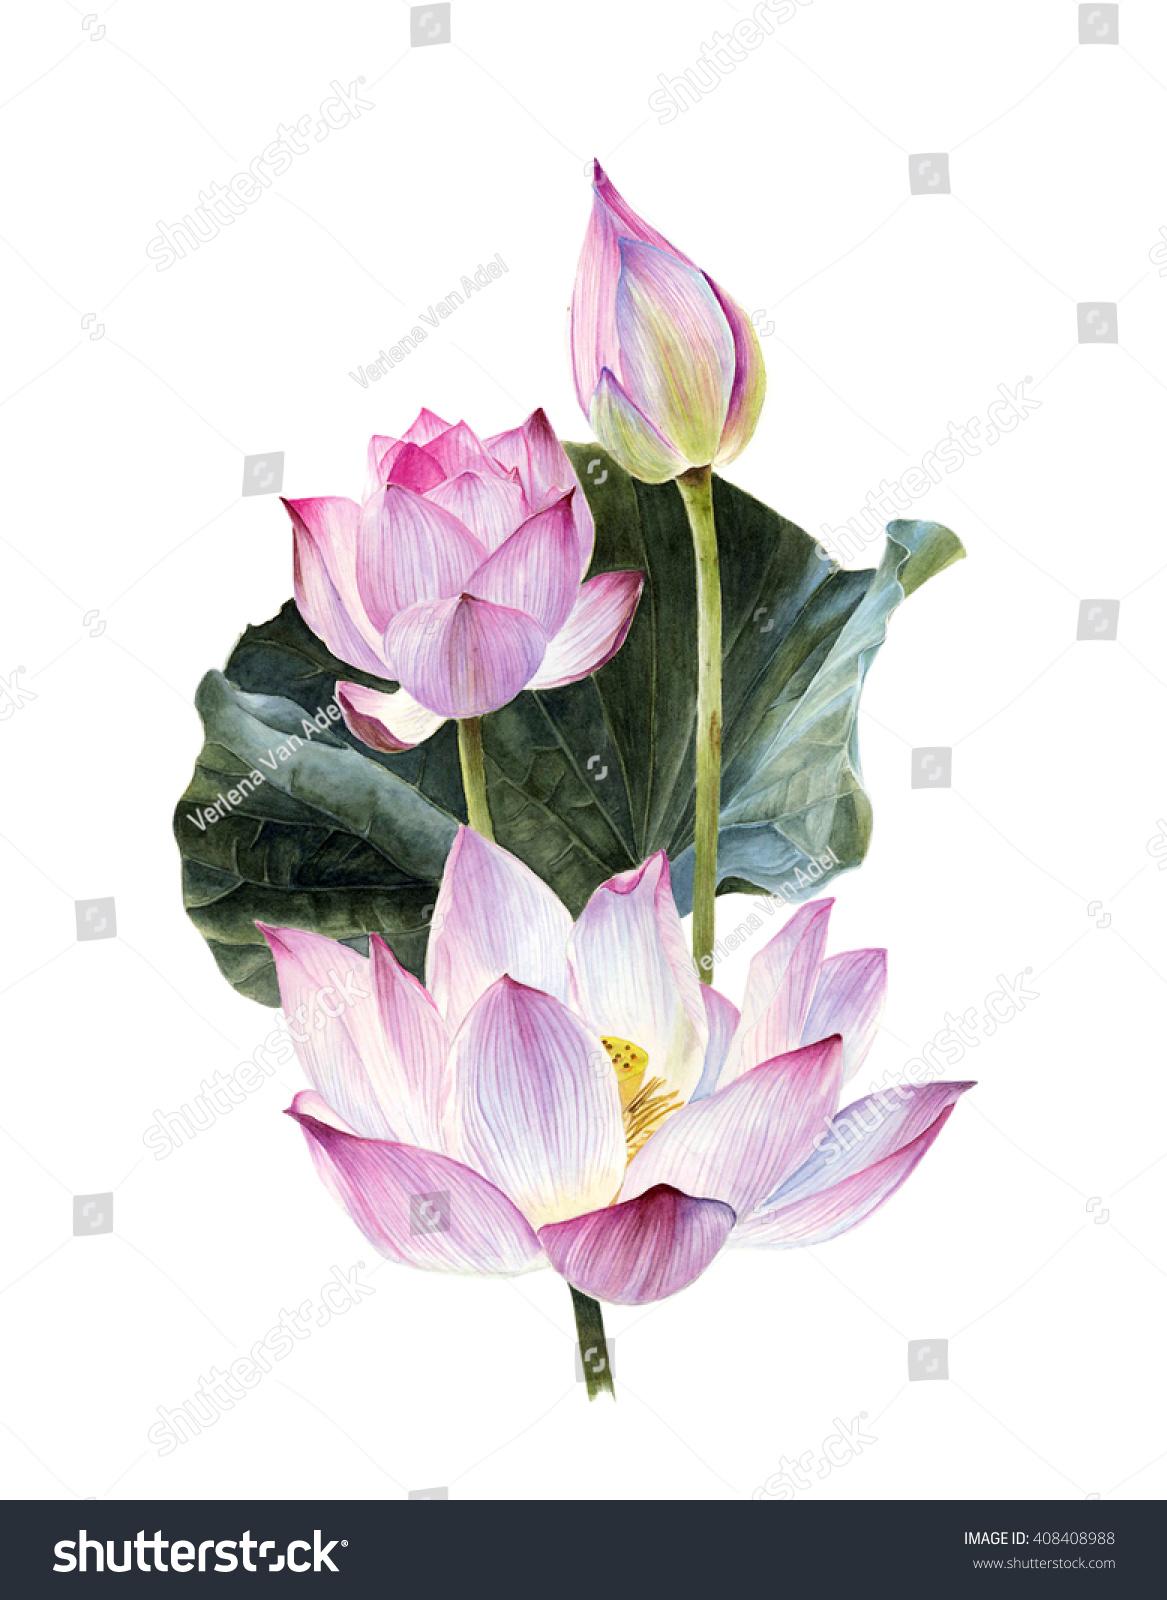 Watercolor Lotus Flowers Illustration Stock Illustration 408408988